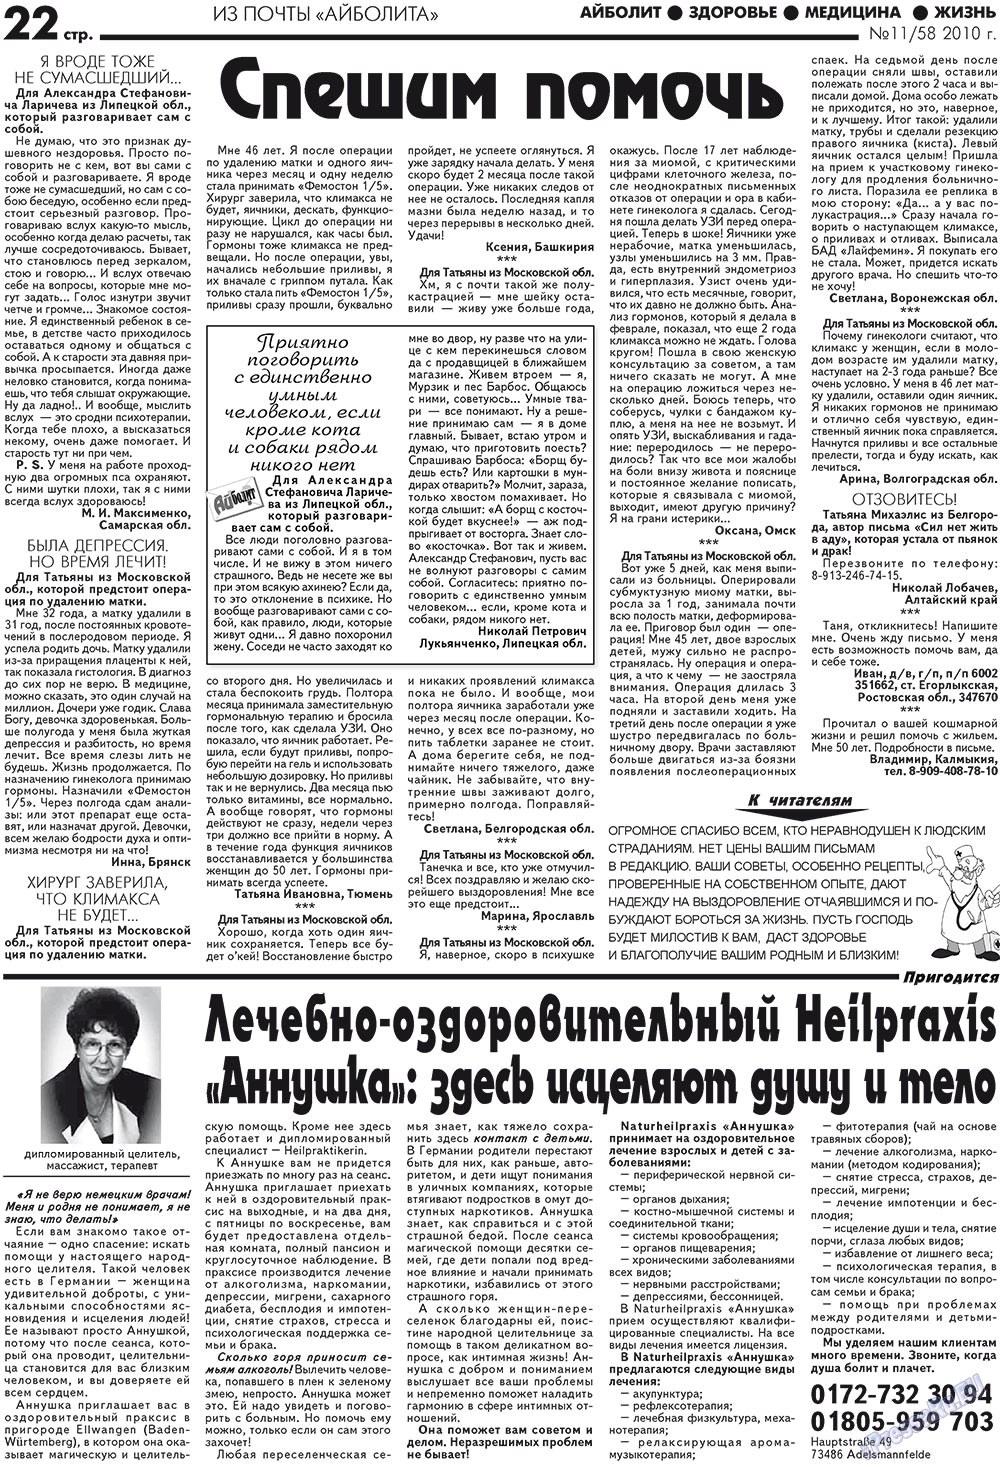 АйБолит (газета). 2010 год, номер 11, стр. 22